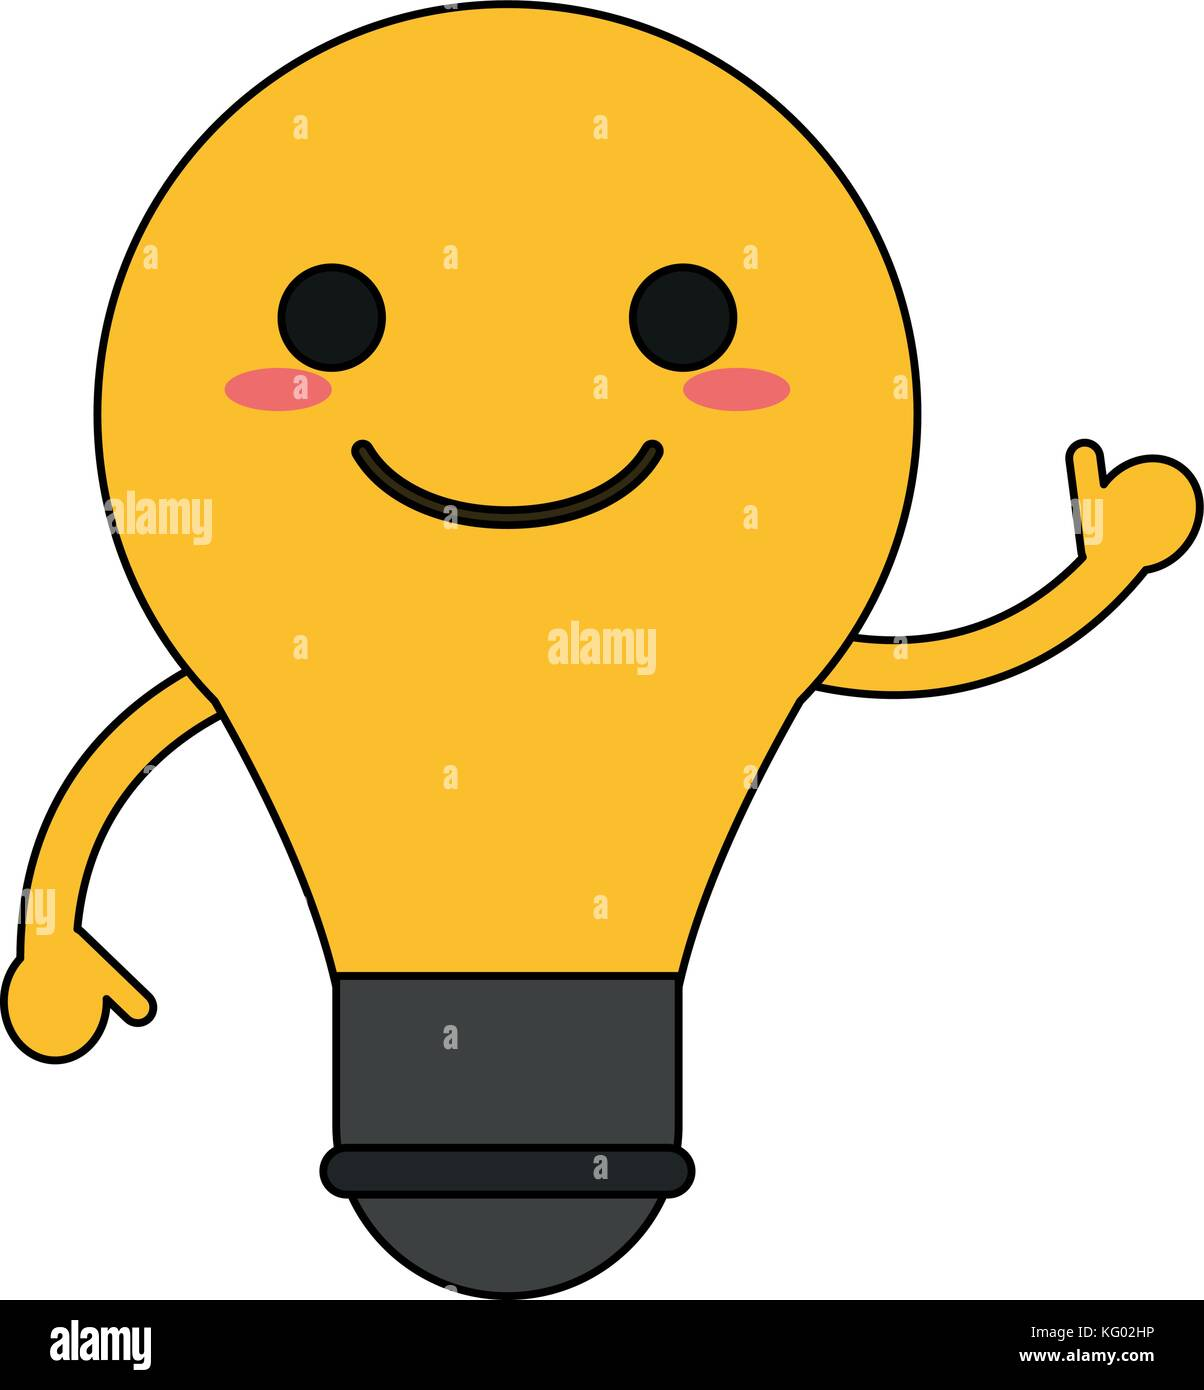 Lightbulb happy cartoon character waving hand icon image stock image